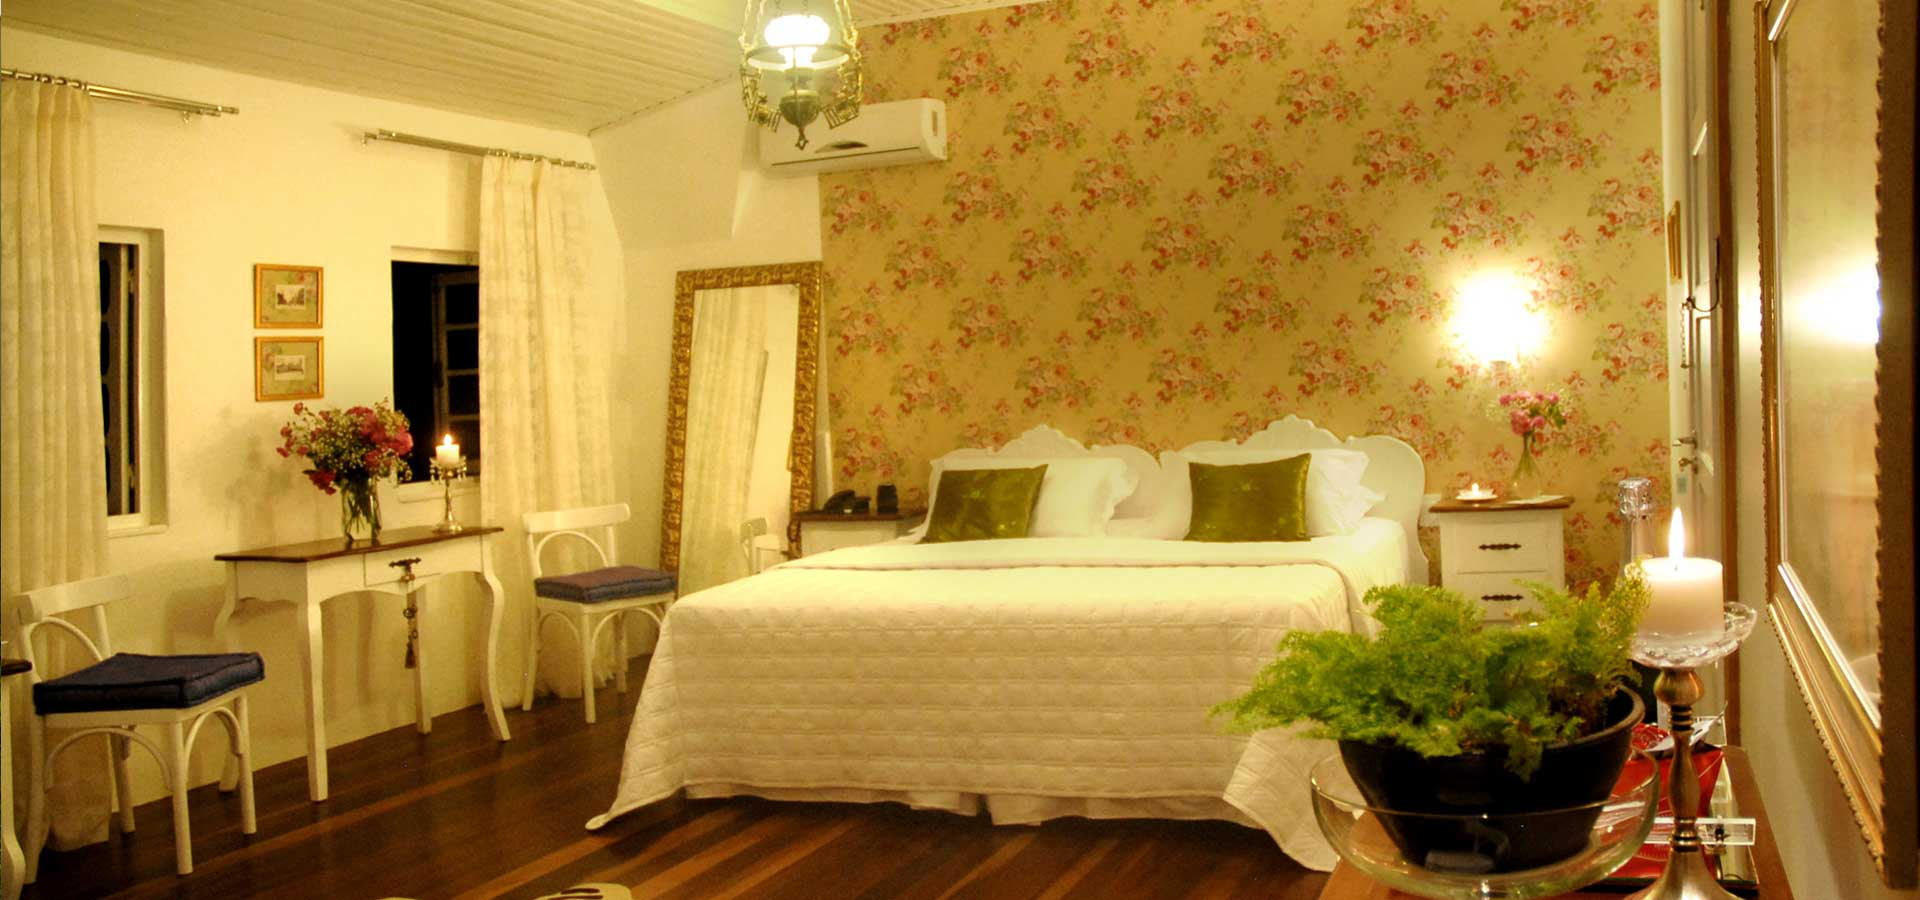 Hotel Jardim Bulevard Suite